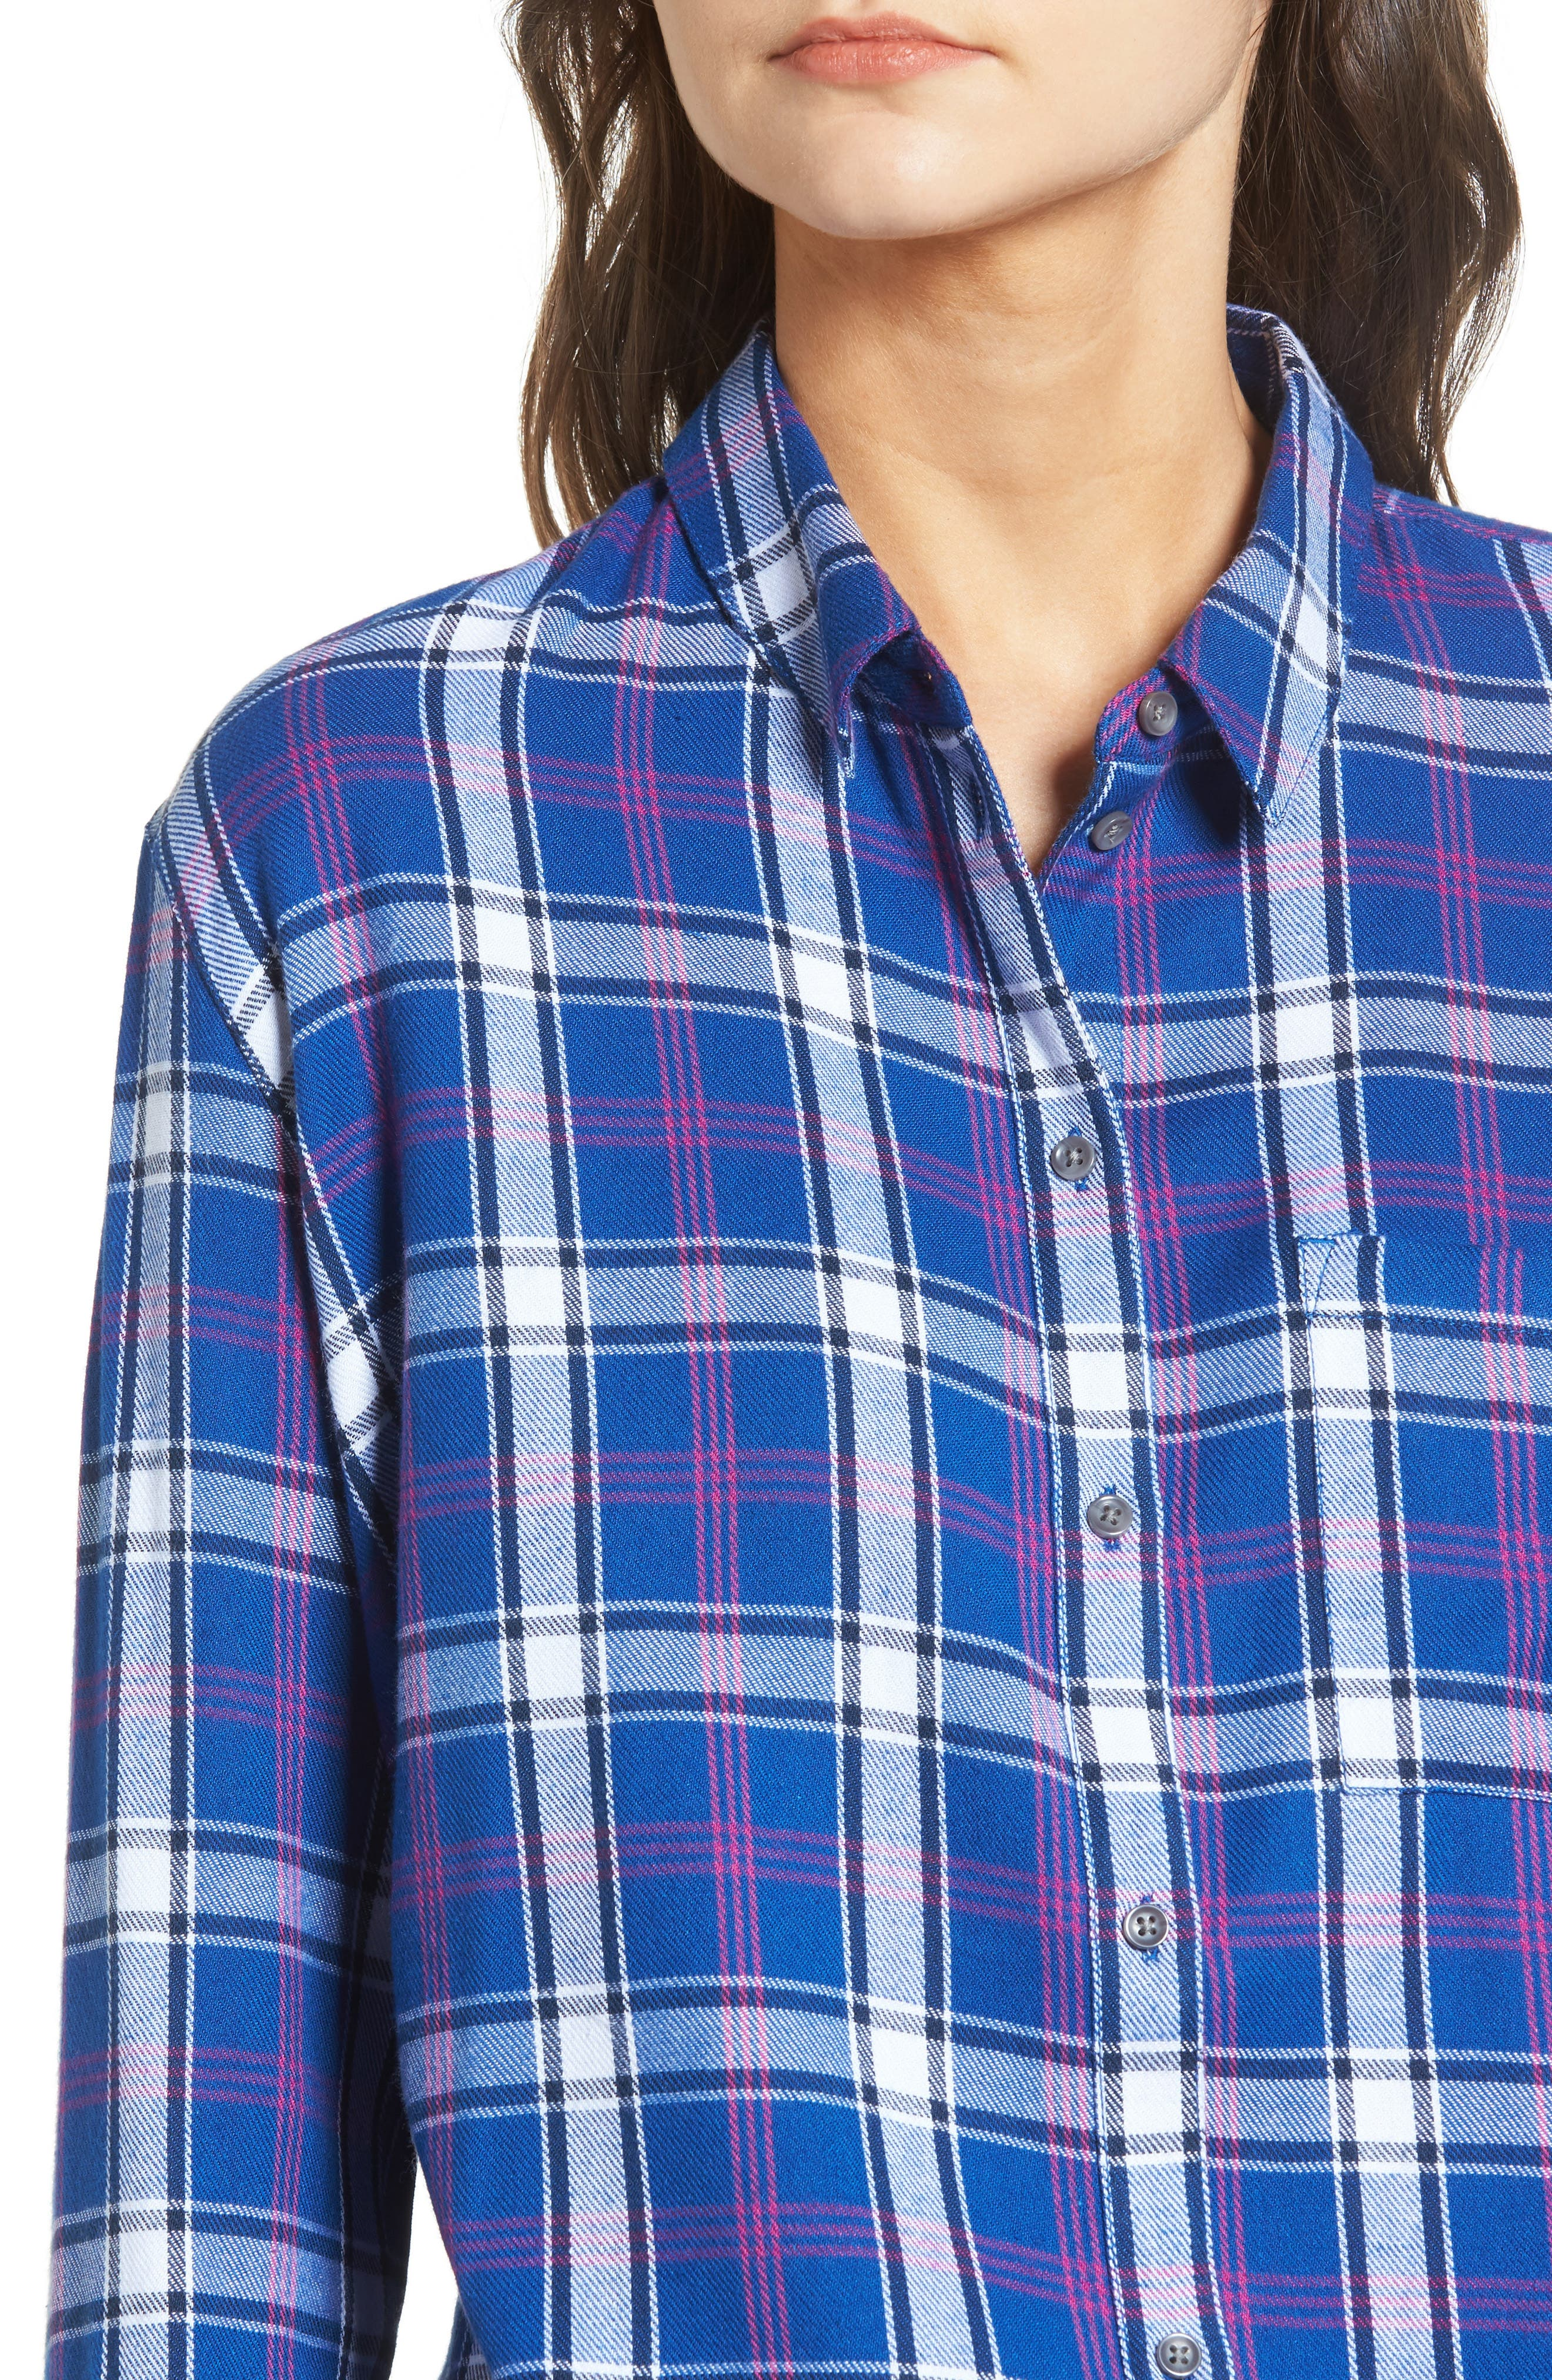 Tartan Boyfriend Shirt,                             Alternate thumbnail 4, color,                             Navy Limoges Weekend Tartan